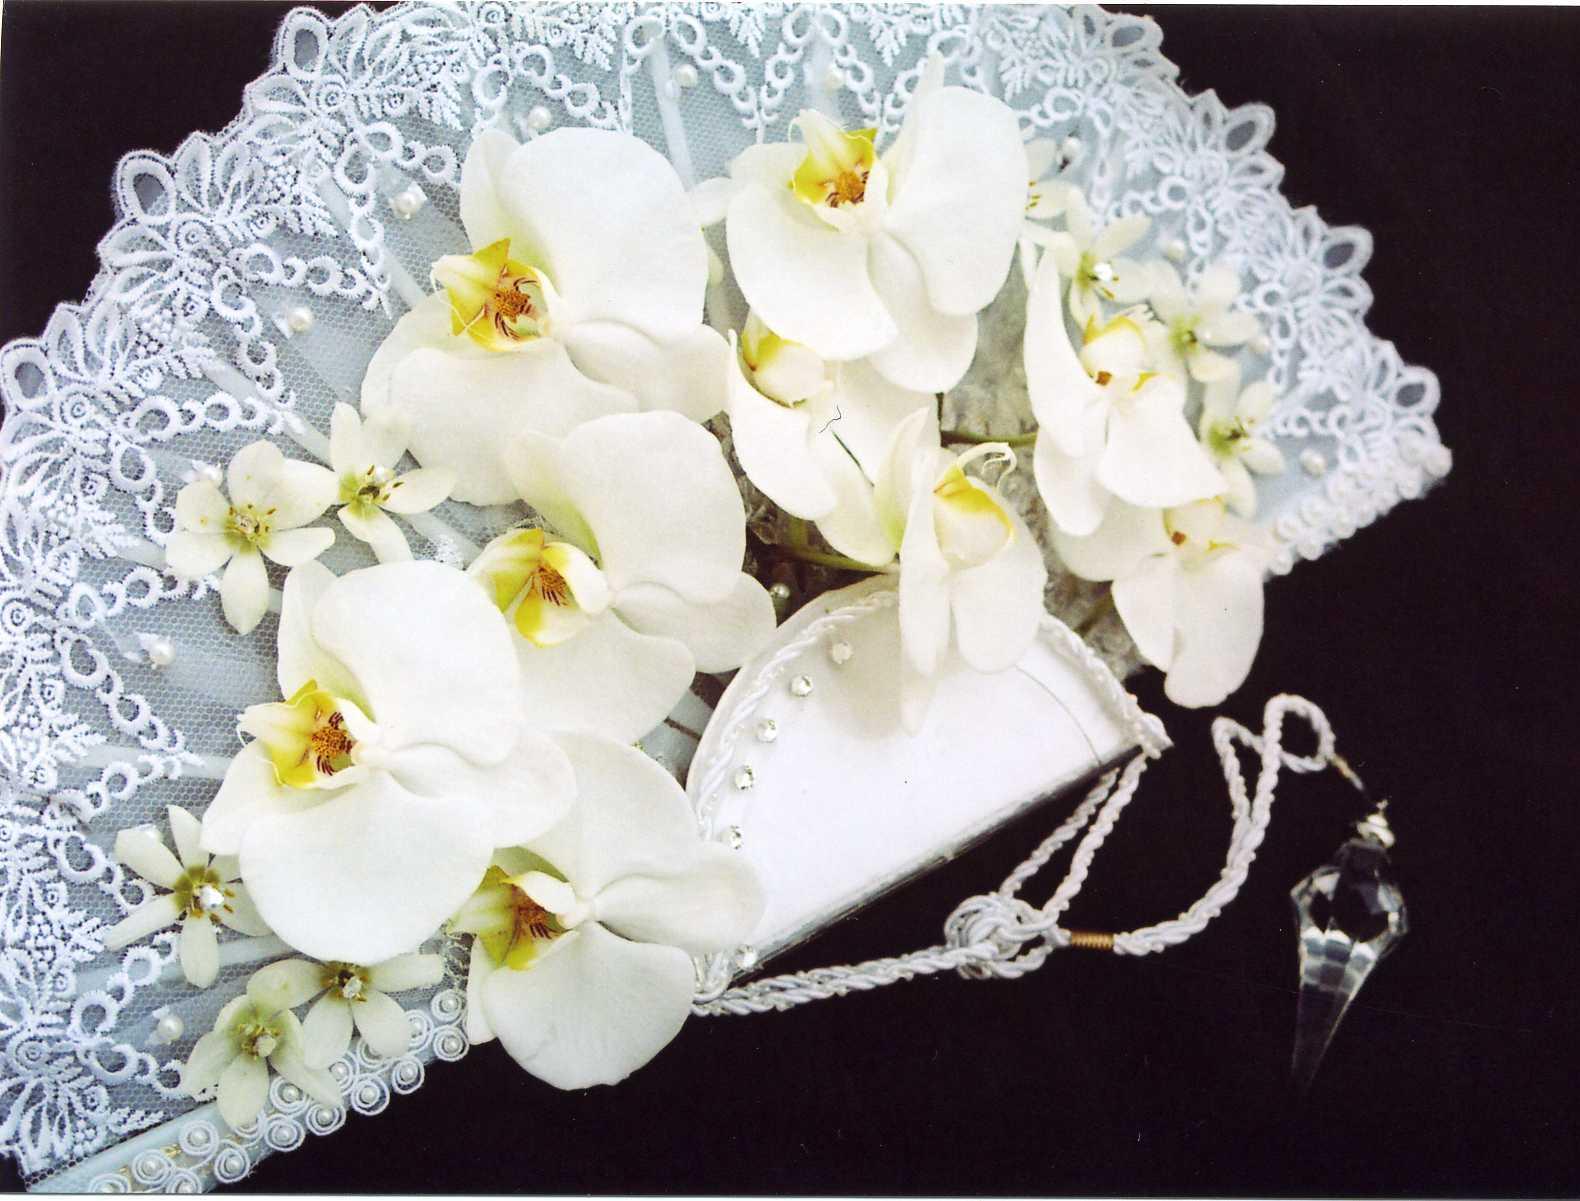 Bouquet Sposa Ventaglio.Ventaglio Bouquet Sposa1 Look Sposa